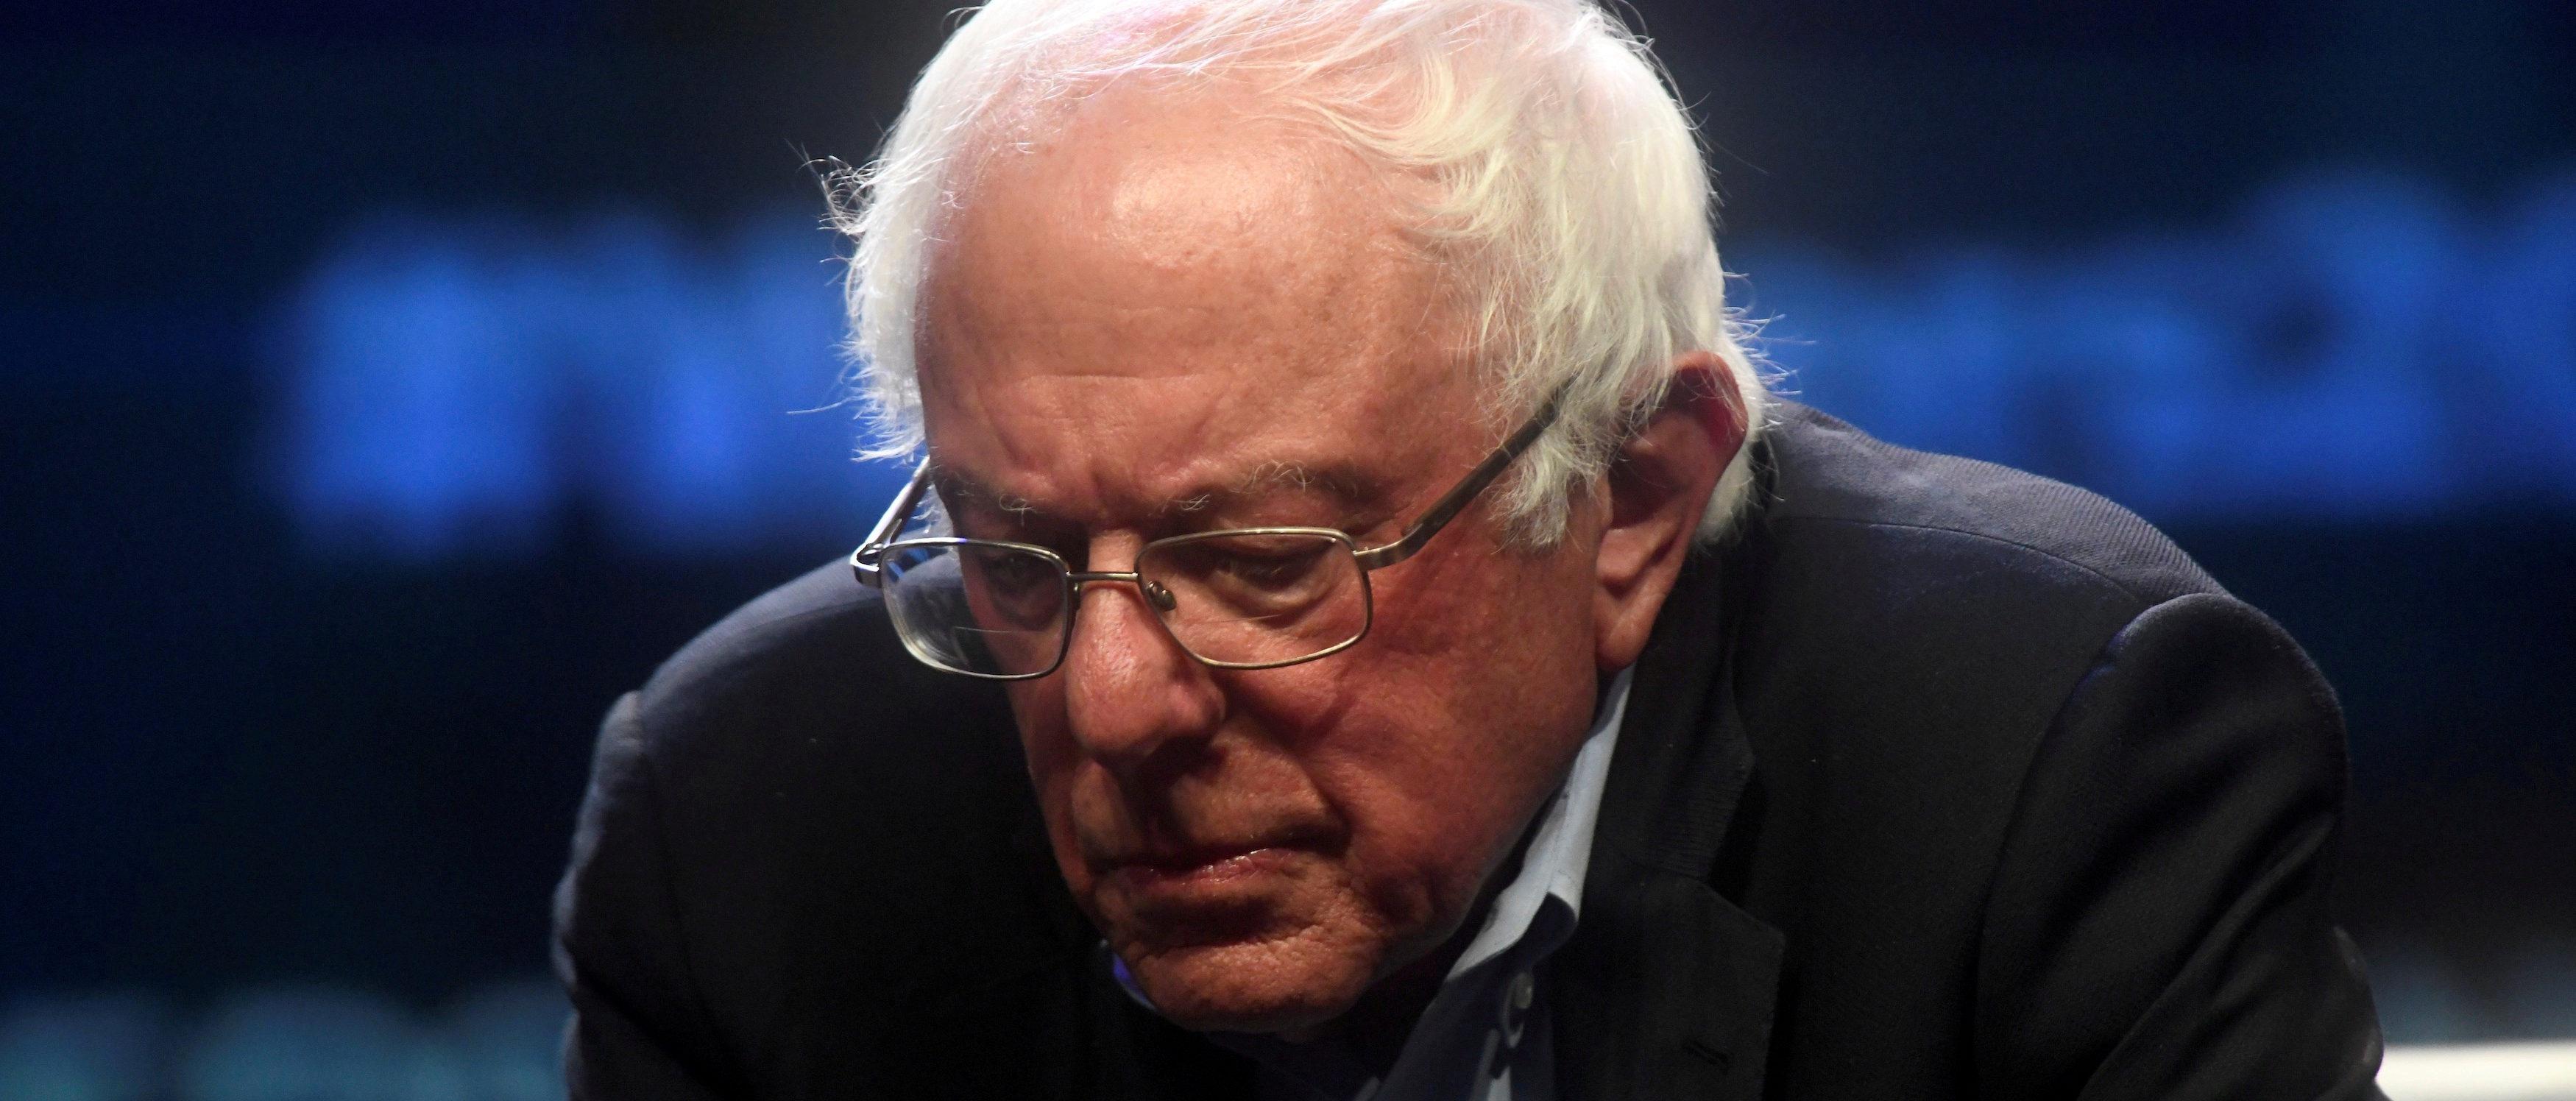 Democratic Presidential candidate U.S. Senator Bernie Sanders (D-VT) addresses attendees during the AFL-CIO Workers Presidential Summit in Philadelphia, Pennsylvania, U.S., September 17, 2019. REUTERS/Mark Makela/File Photo